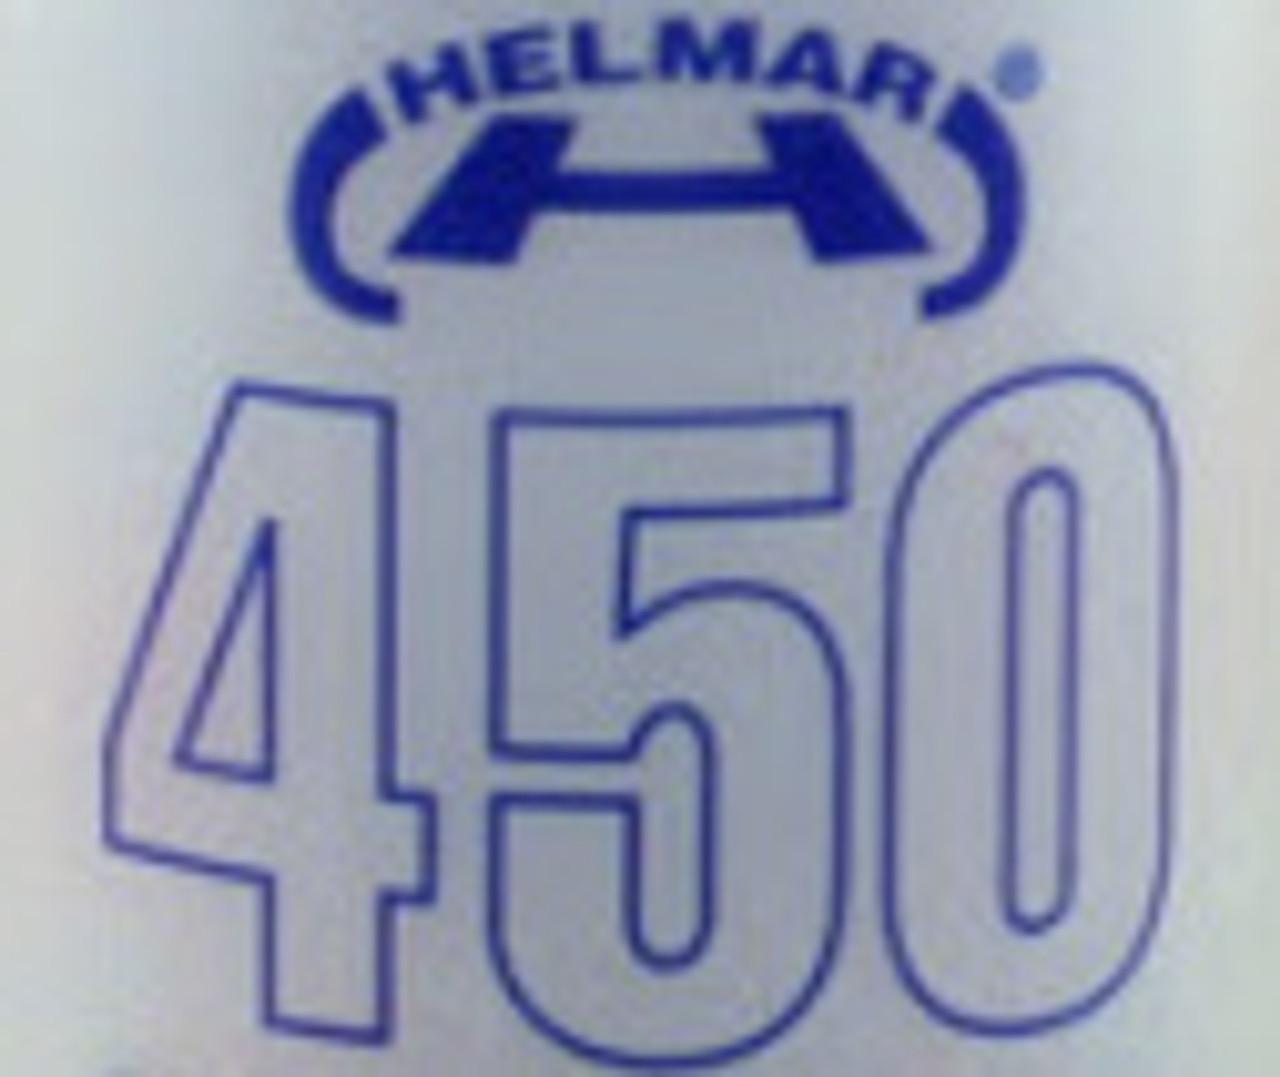 Helmar 450